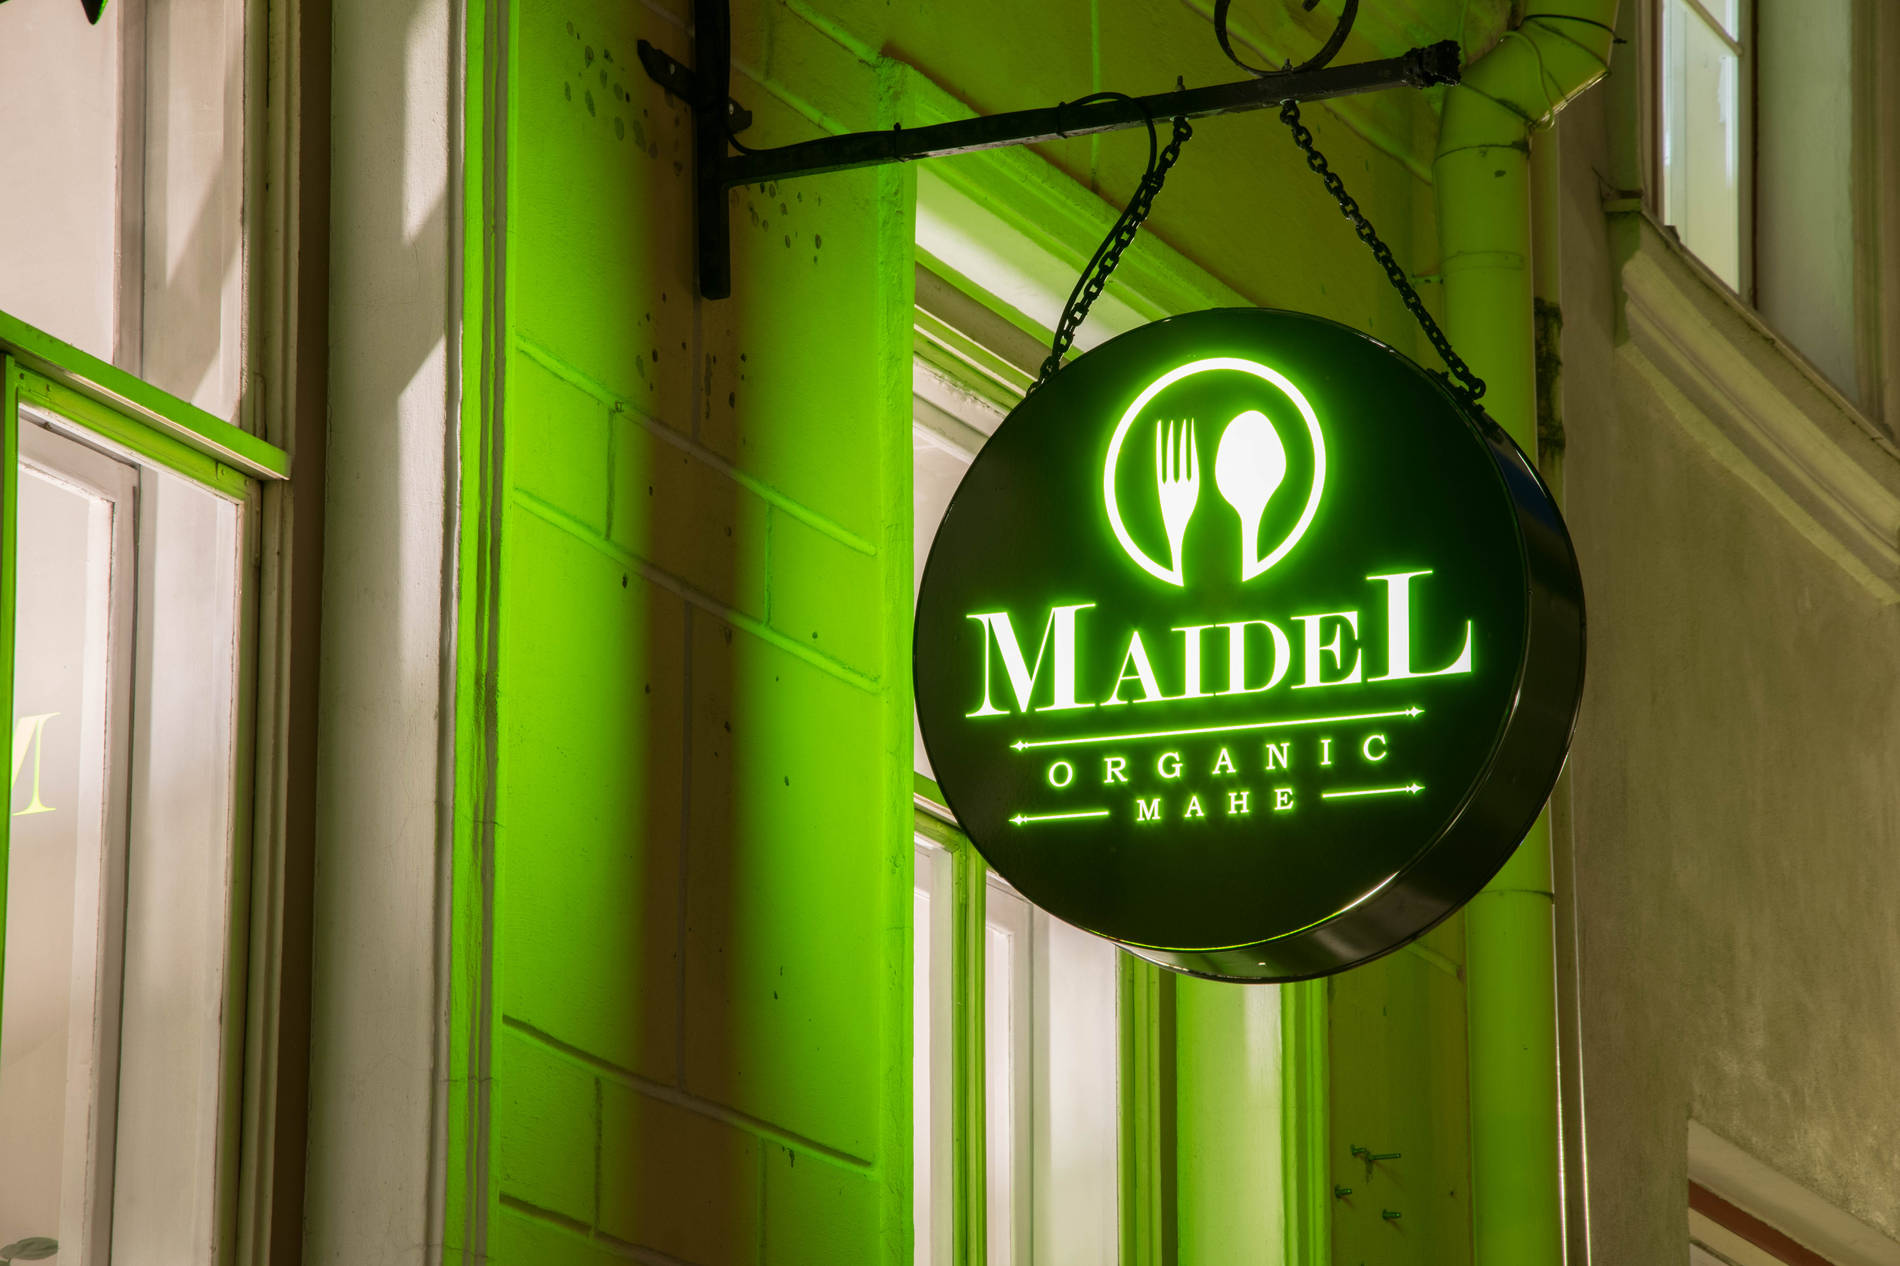 Maidel Organic